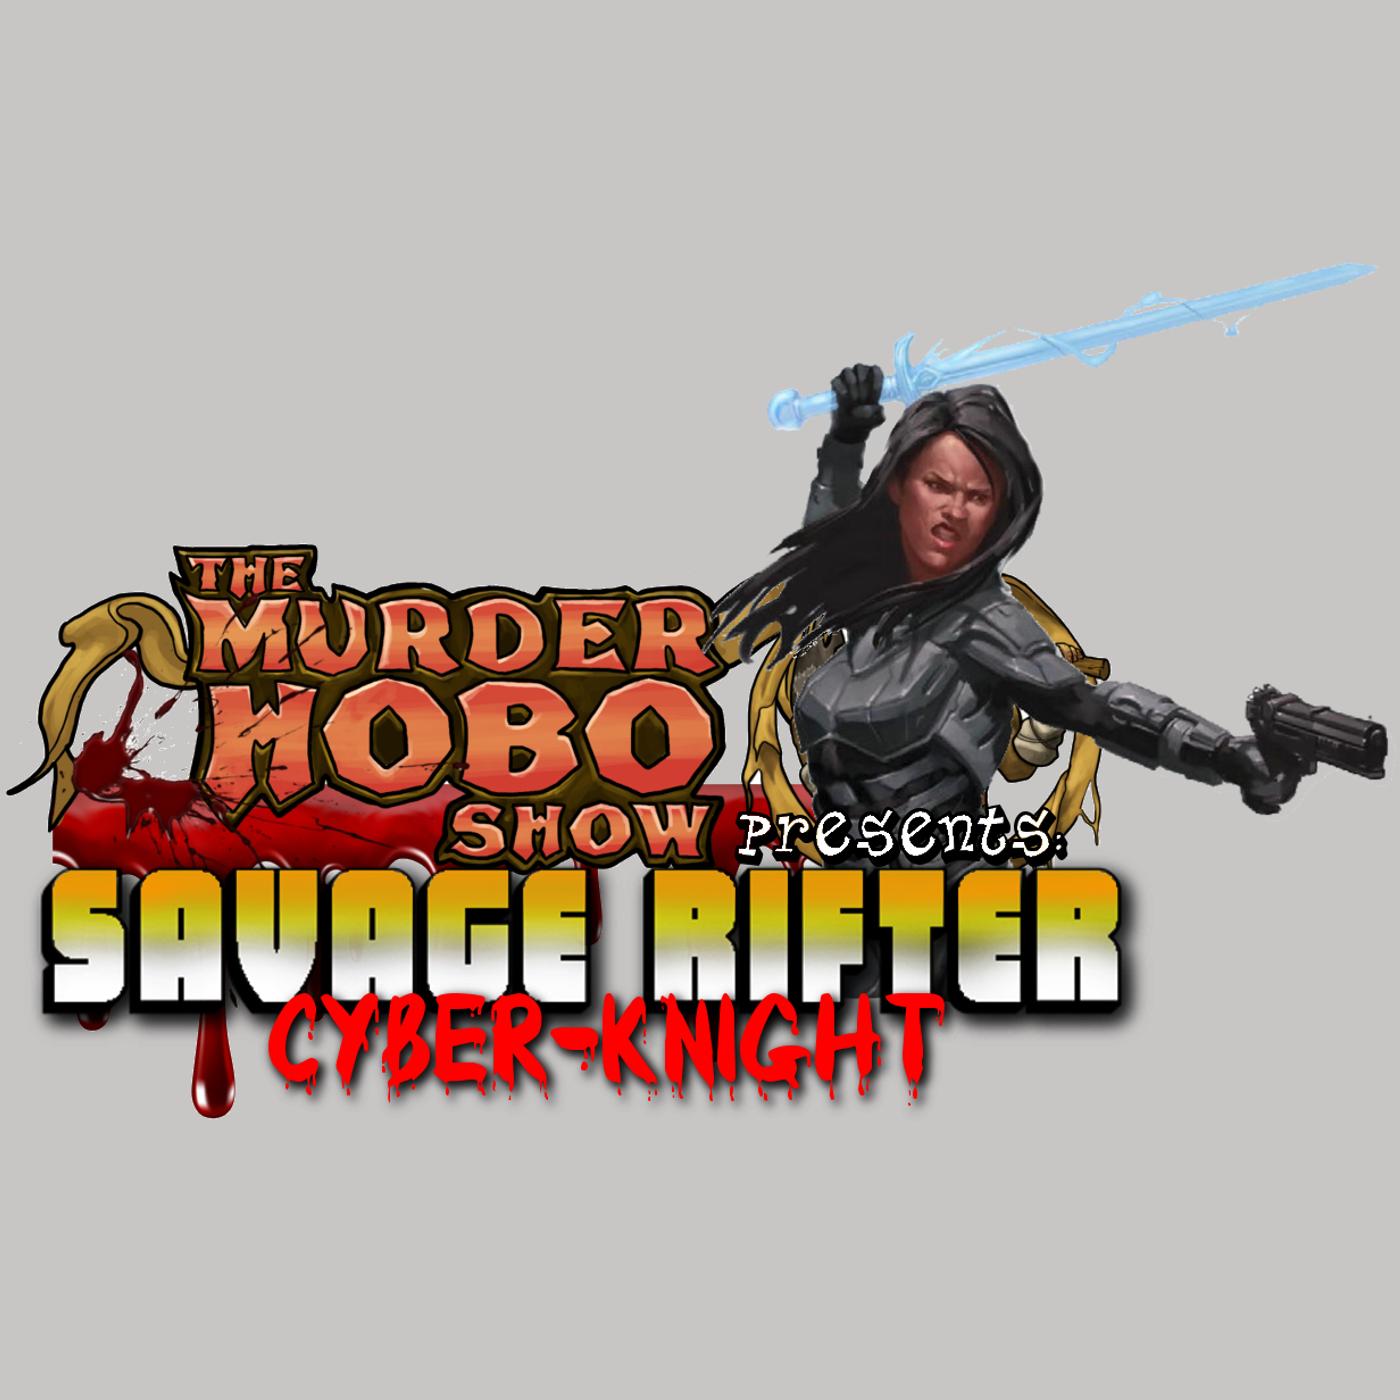 Savage Rifter Ep 4: Cyber-Knight